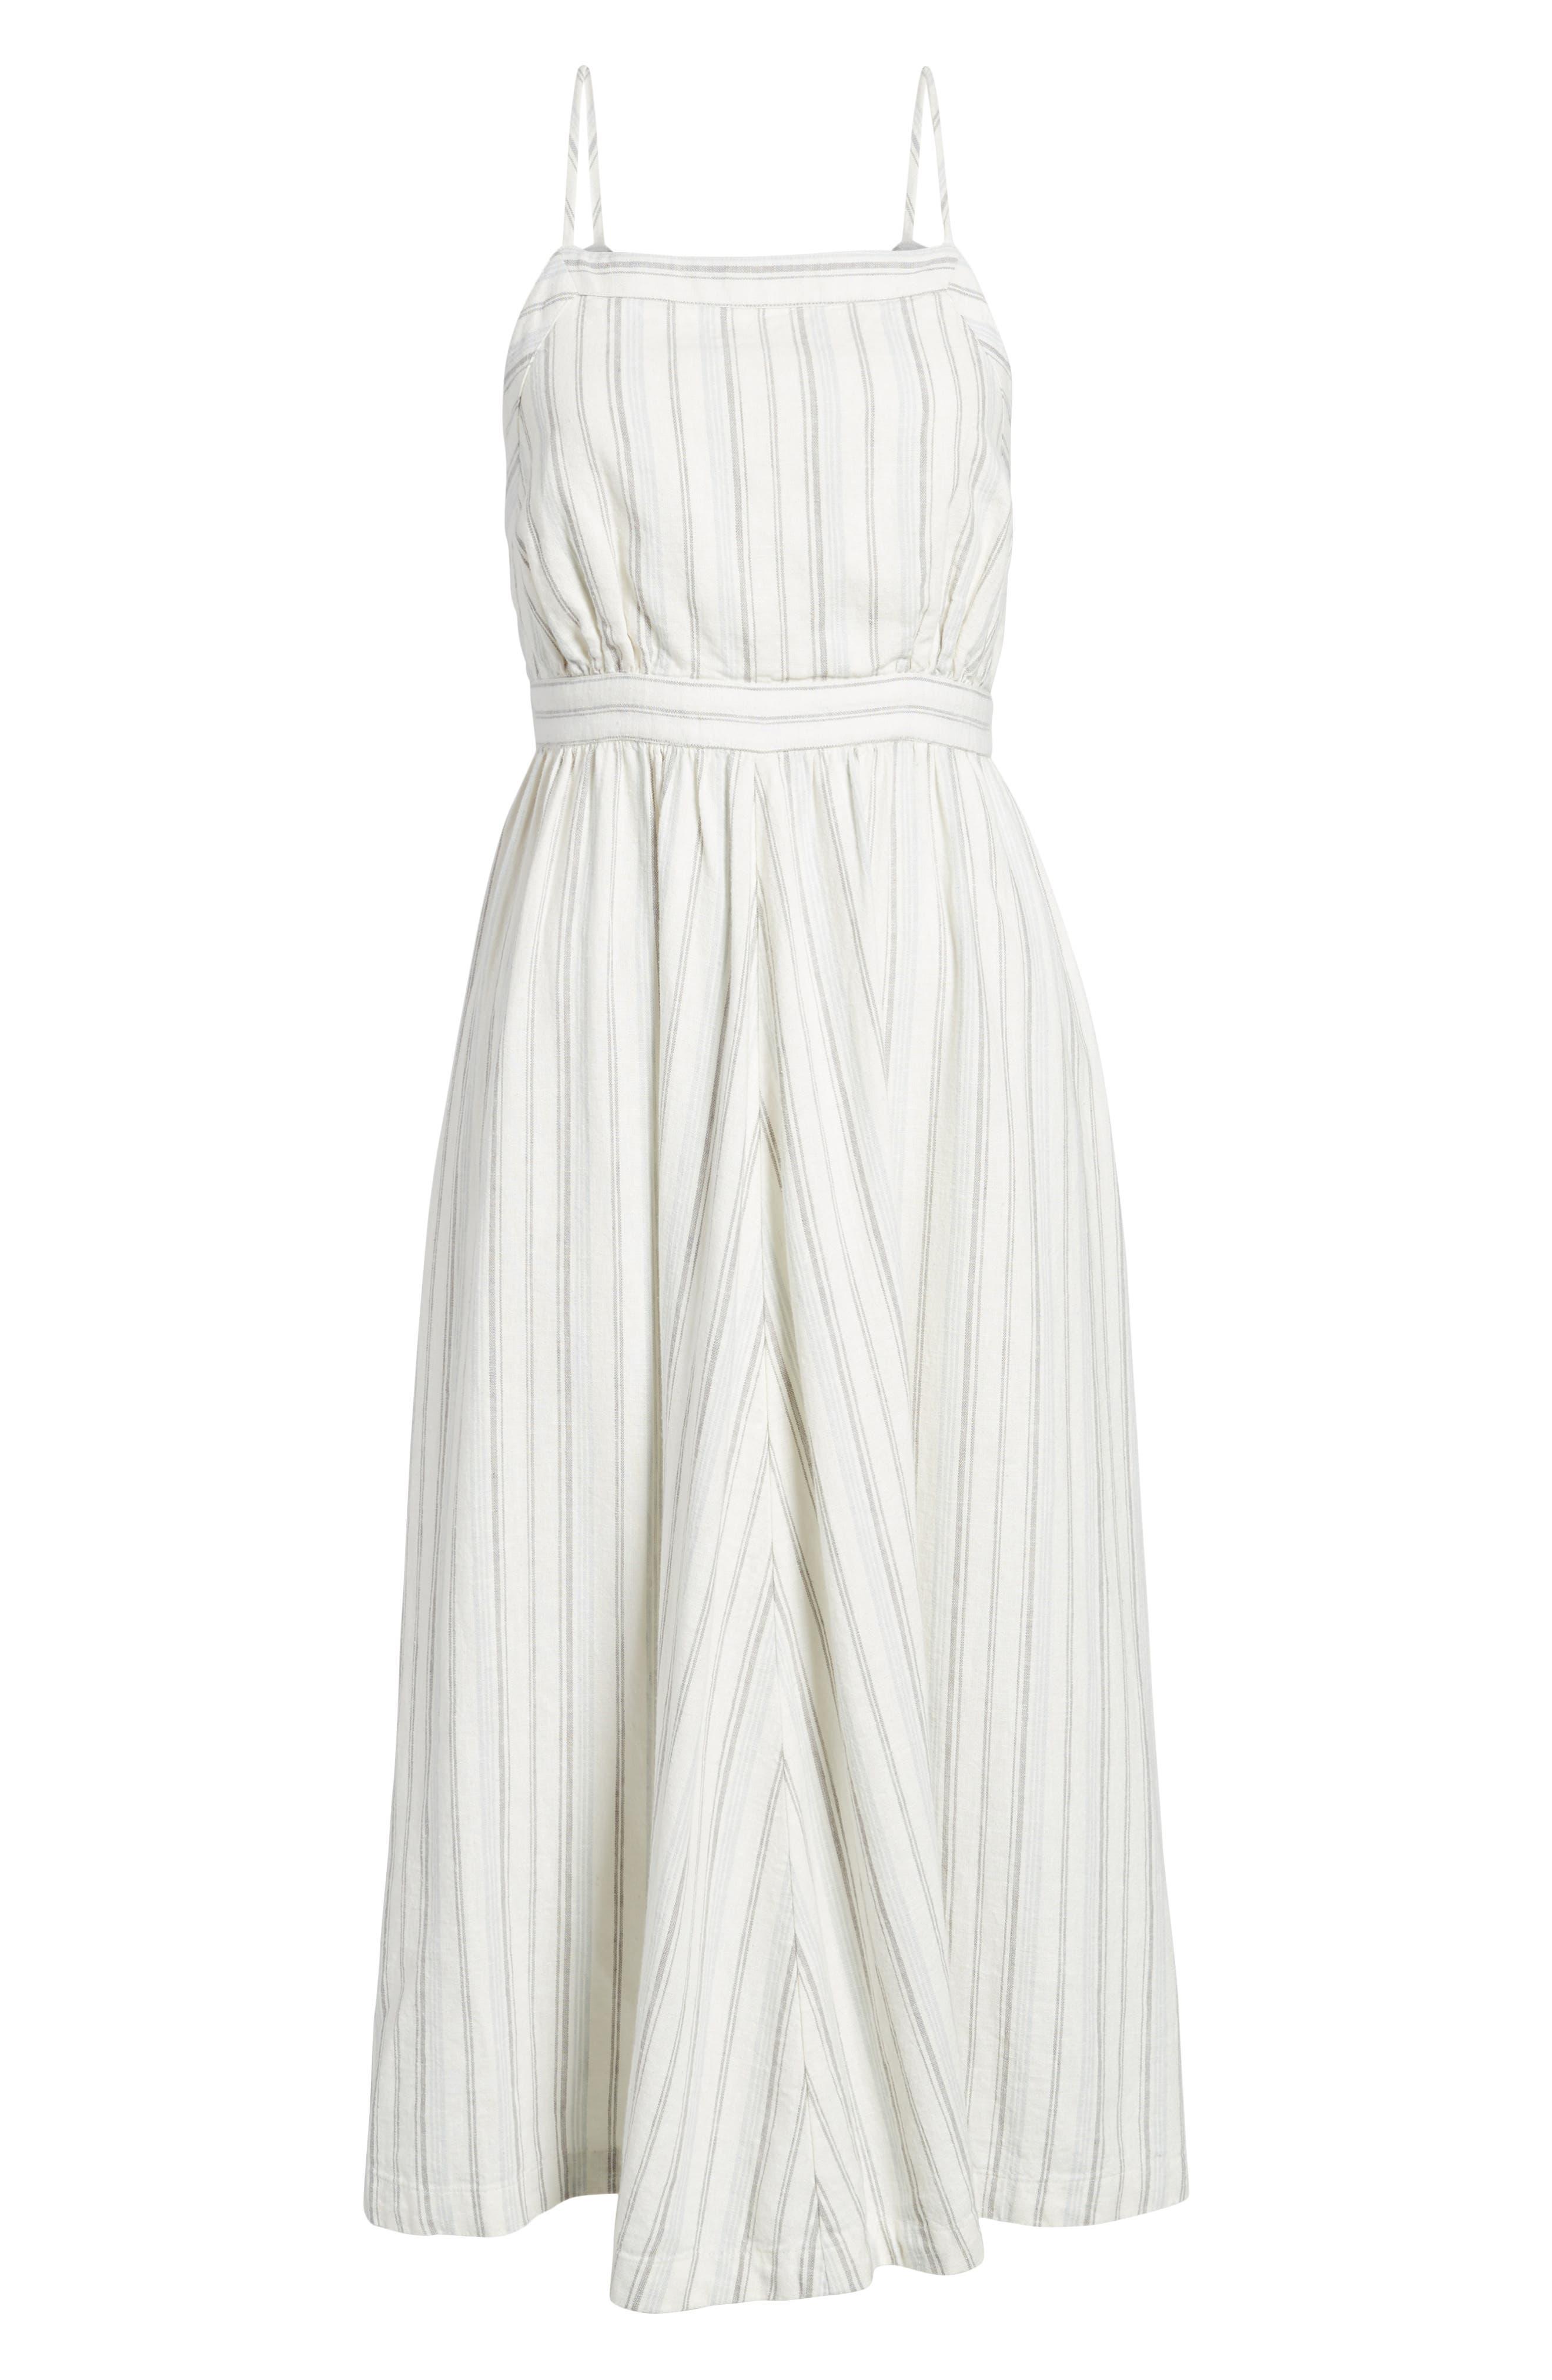 Stripe Apron Dress,                             Alternate thumbnail 6, color,                             Ivory Verigated Stripe